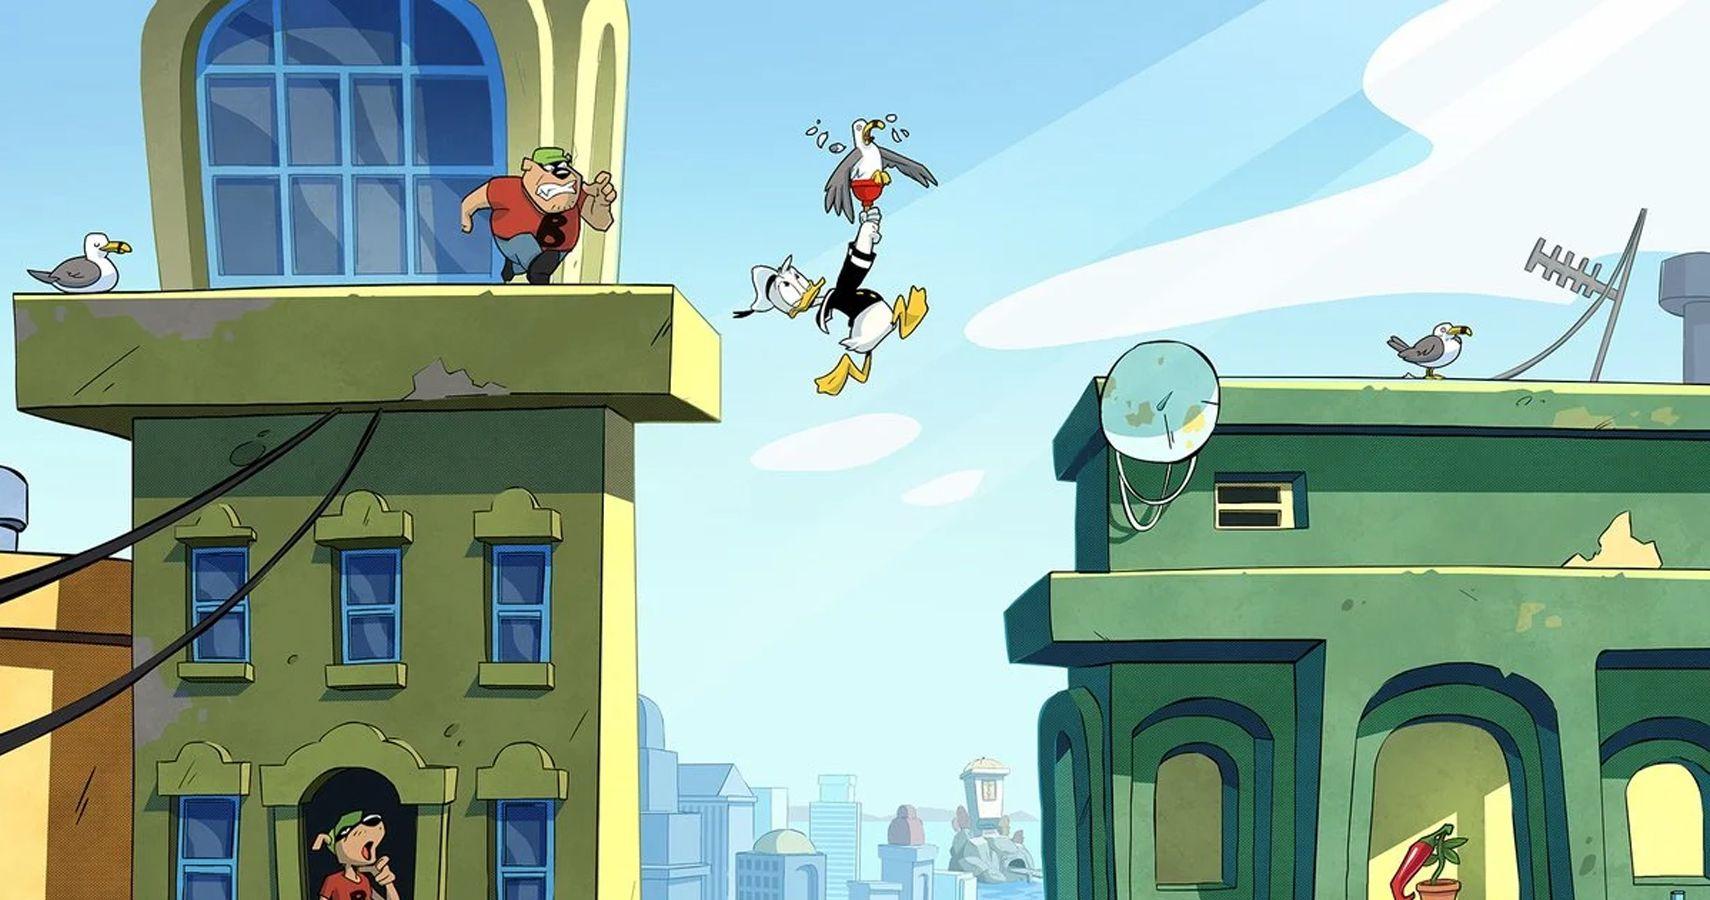 Disney Turned Down A New Ducktales Quackshot Game Thegamer